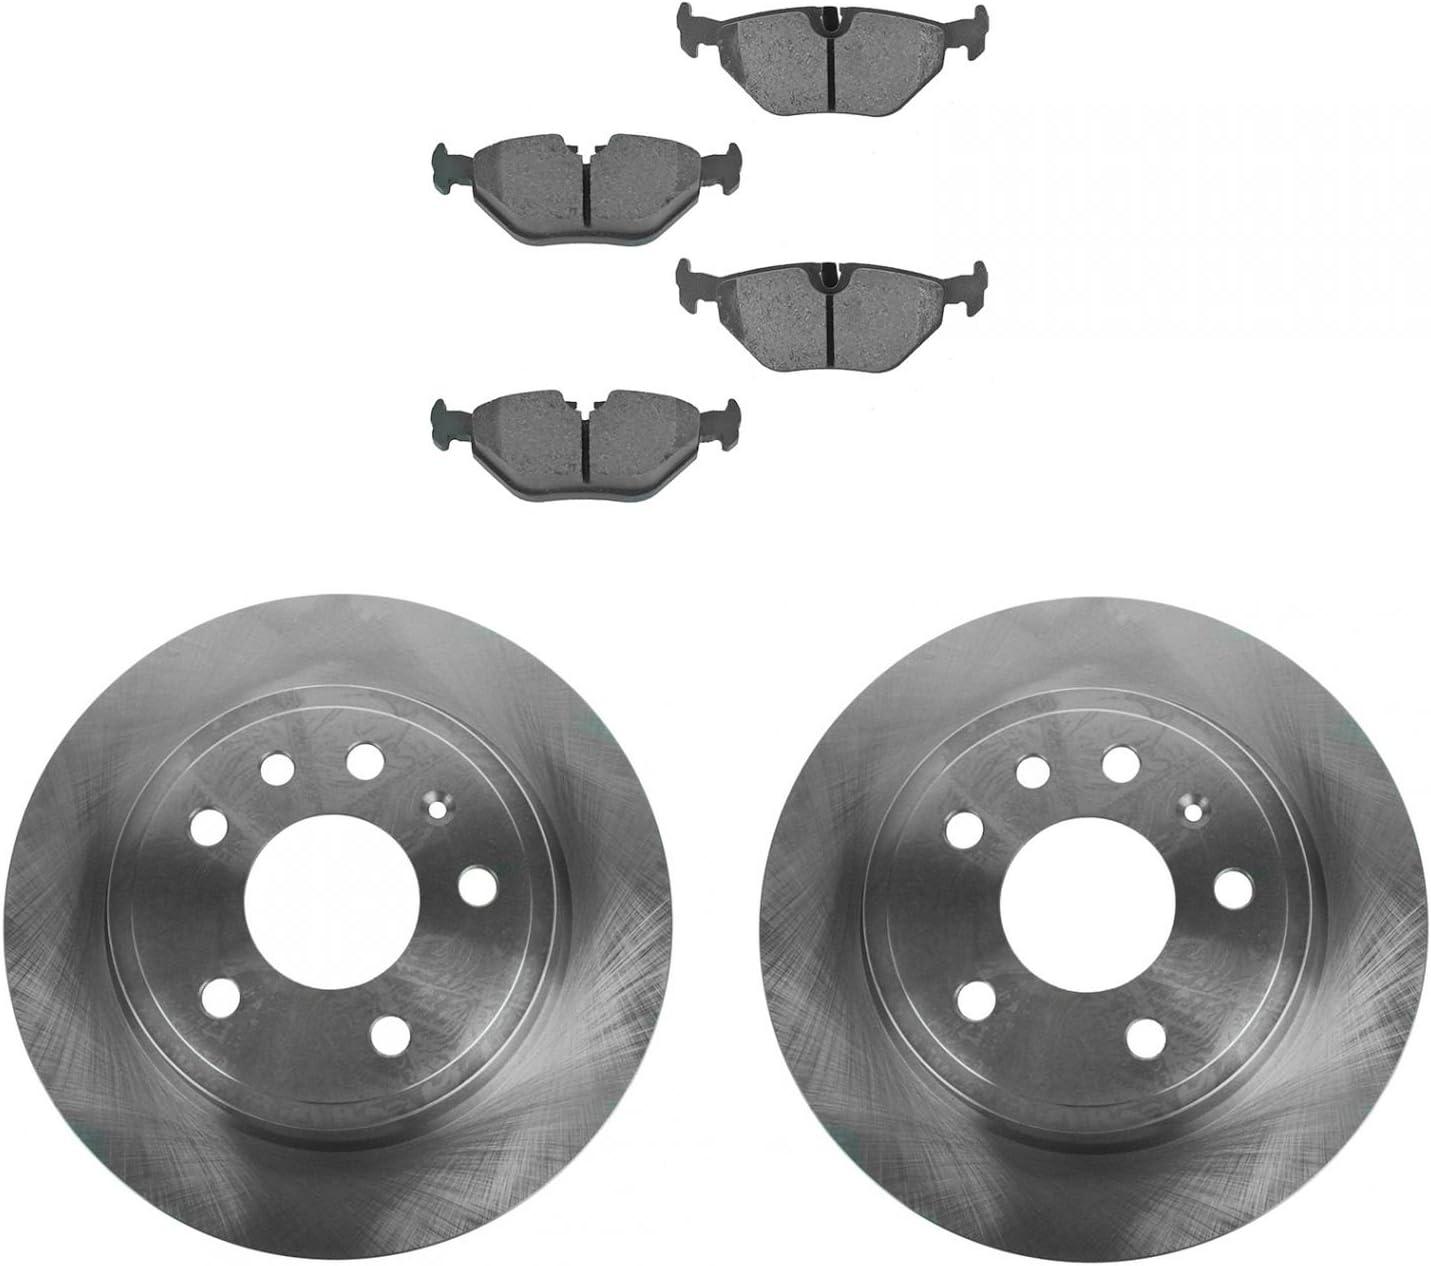 For 2005 Saab 9-3 Hart Brakes Front Rear Semi-Metallic Brake Pads